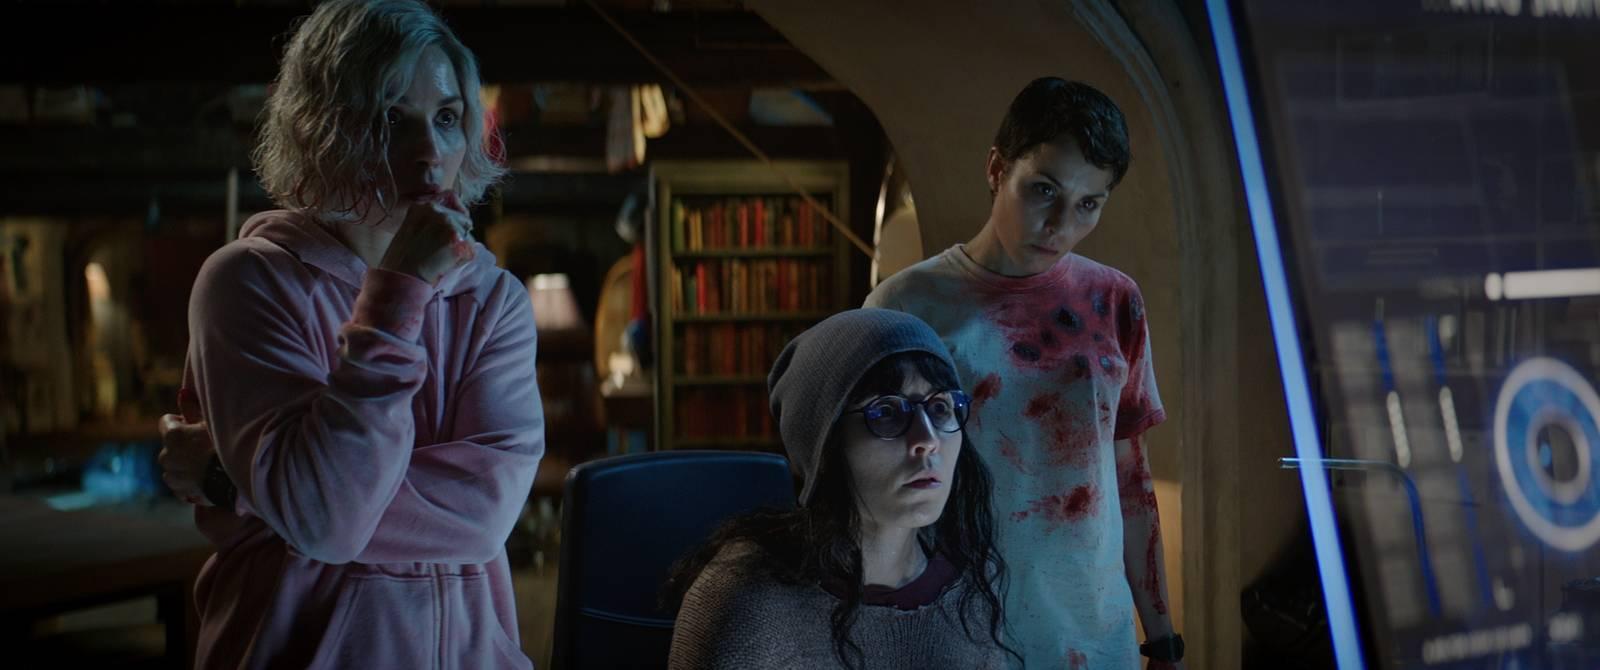 Film 7 sestier (2017)